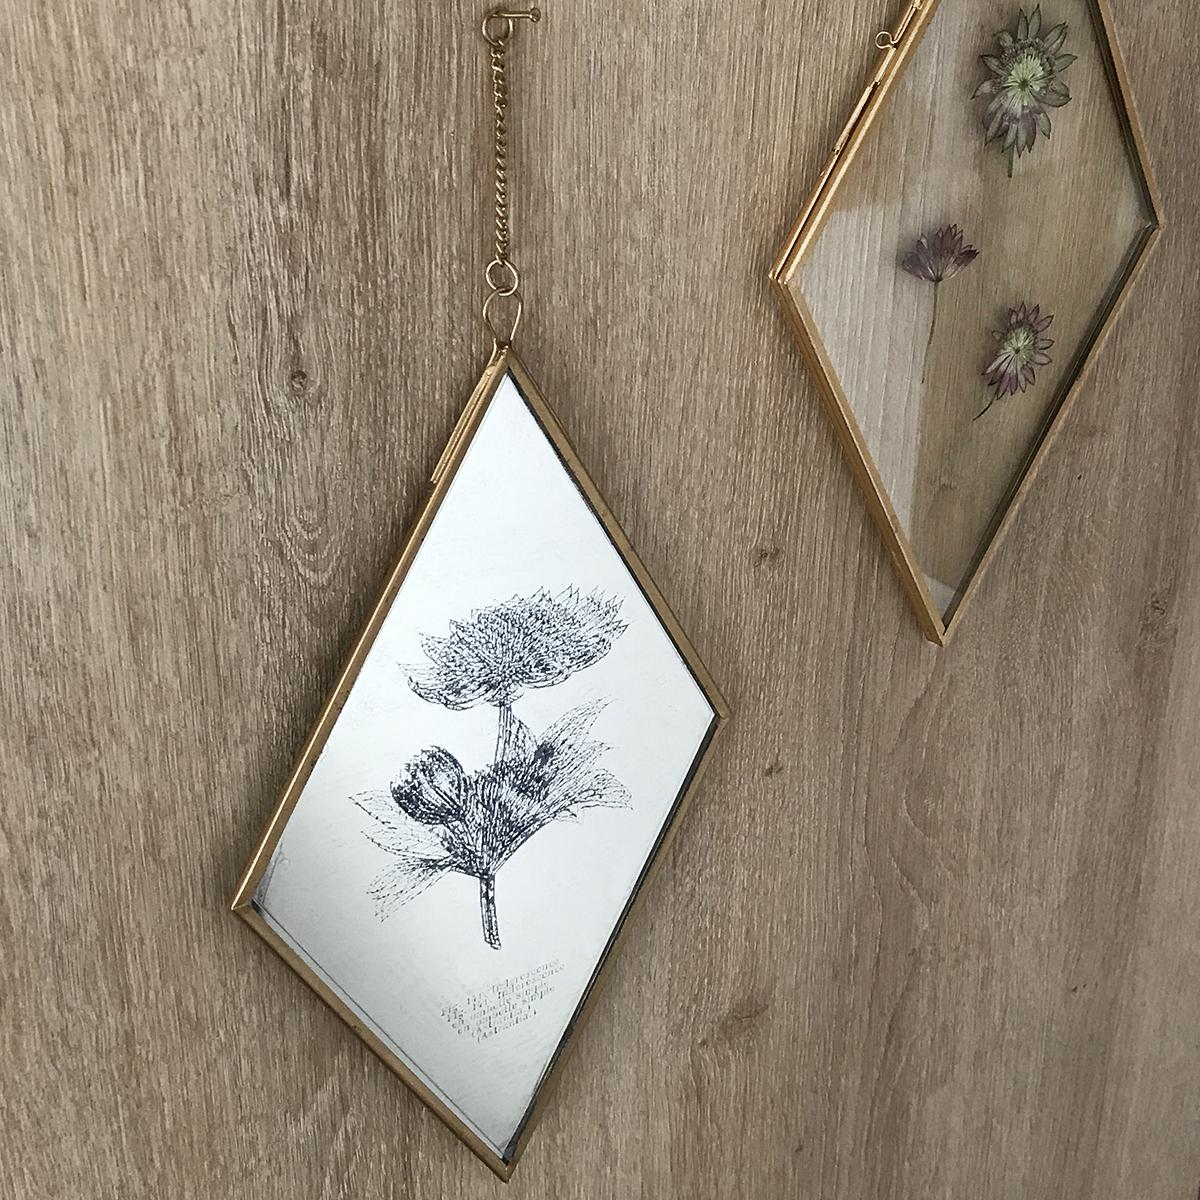 herbier-tendance-diy-gravure-miroir-3.jpg